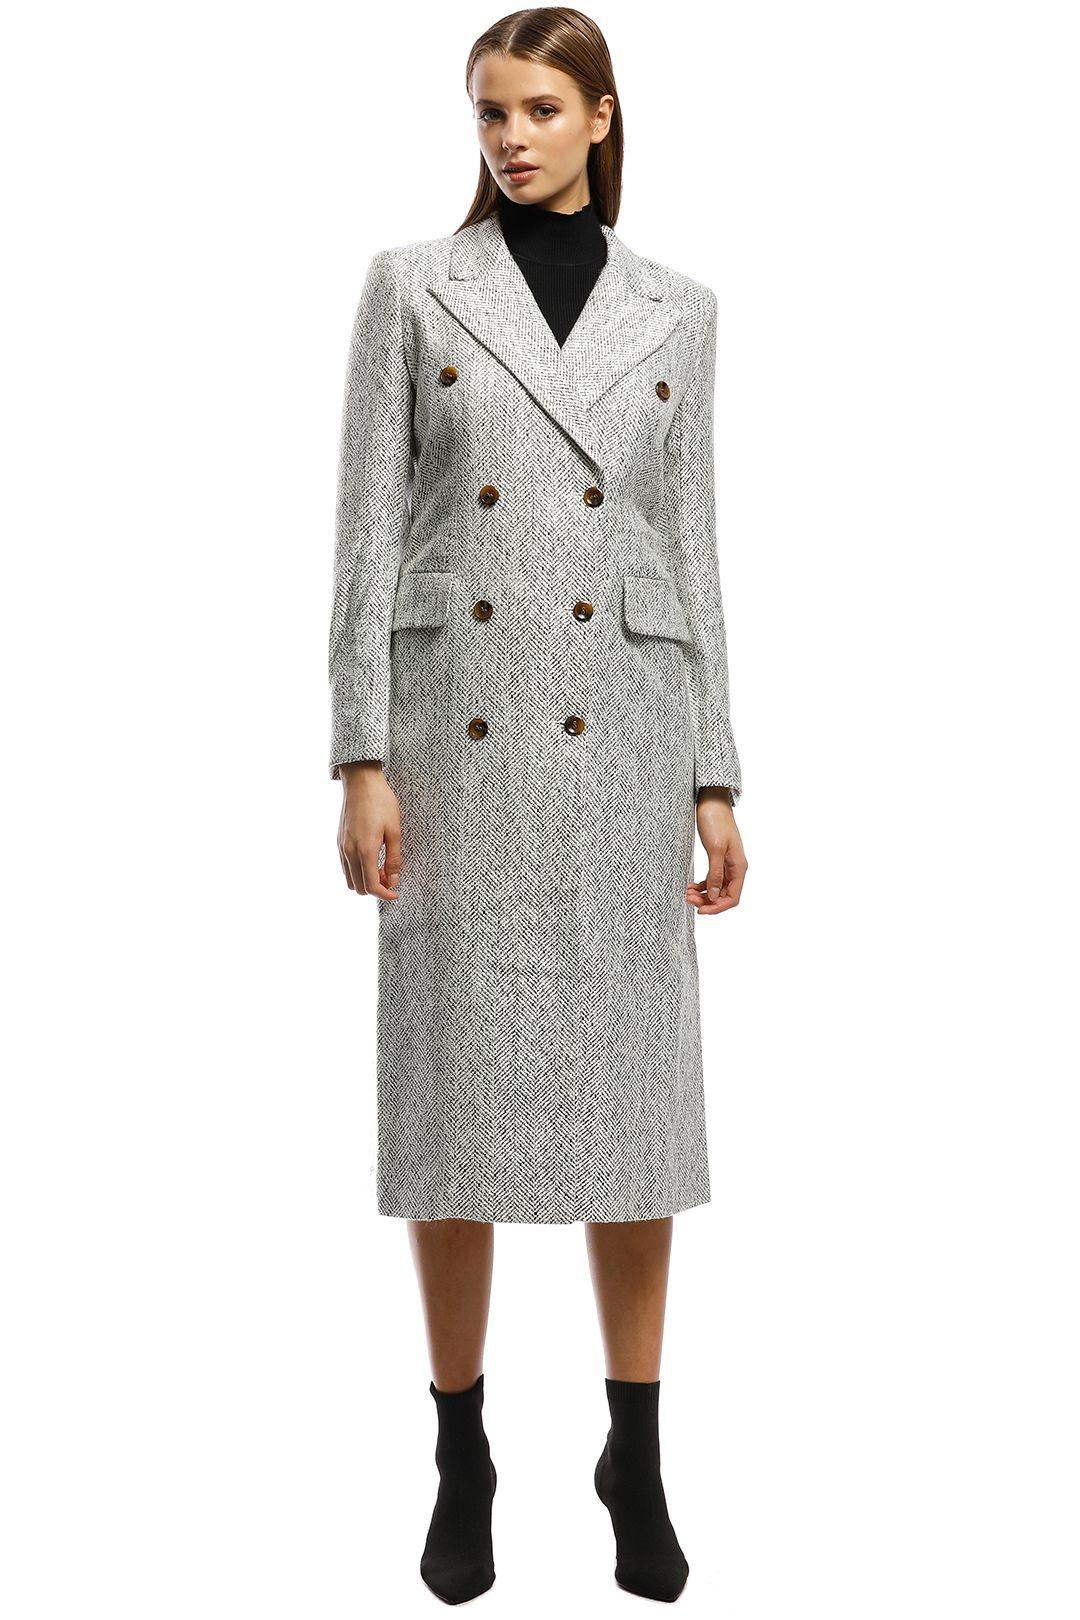 Pasduchas - Maverick Coat - Grey - Front